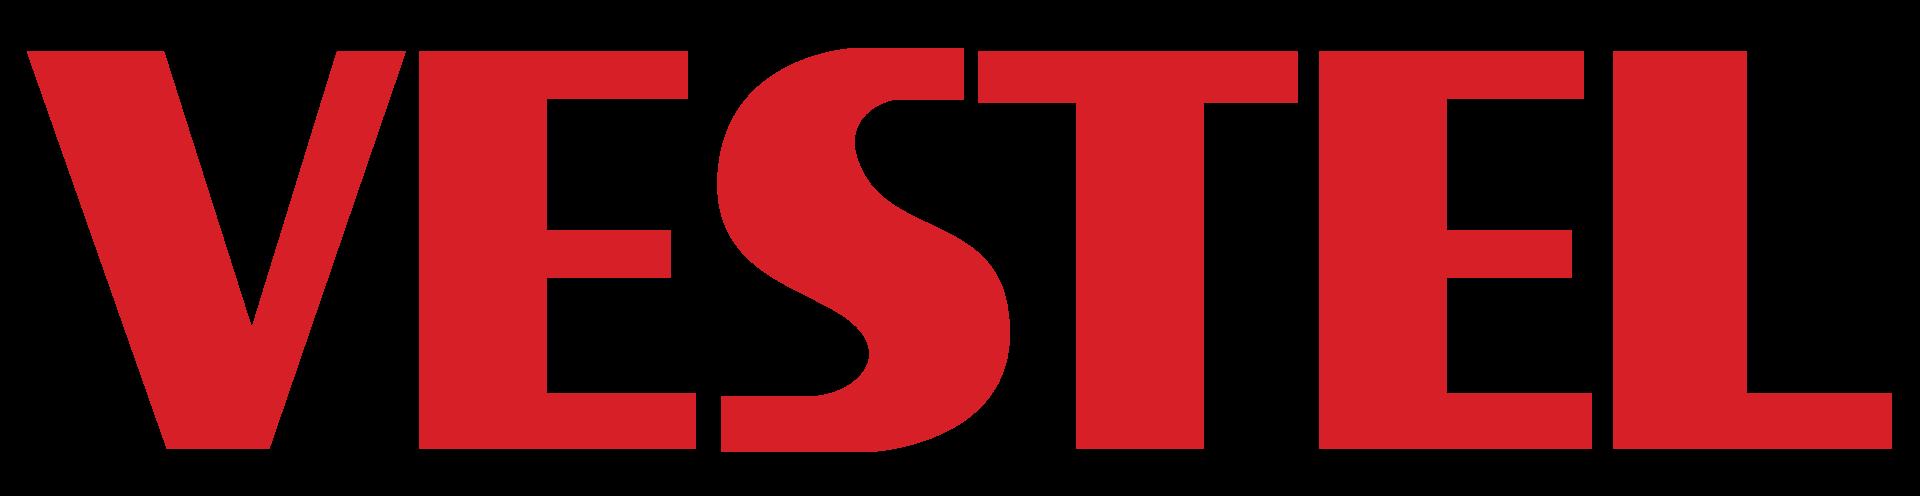 vestel-kirmizi-logo-buyuk